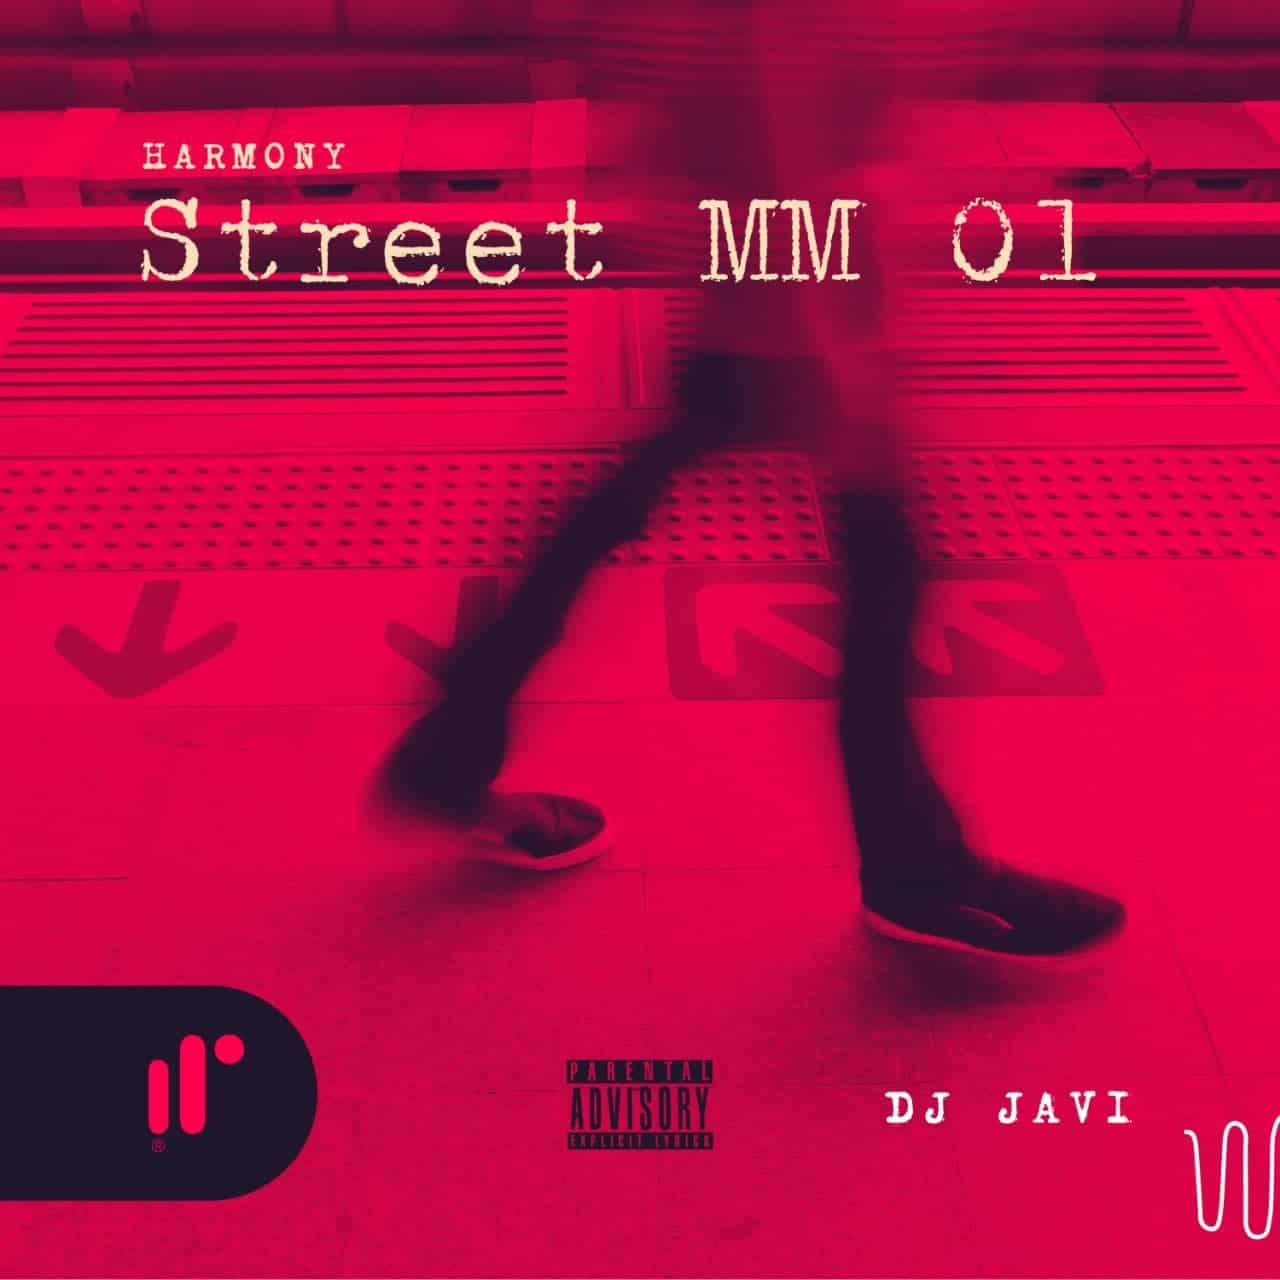 Harmony Street MM 01 DJ JAVI JOG